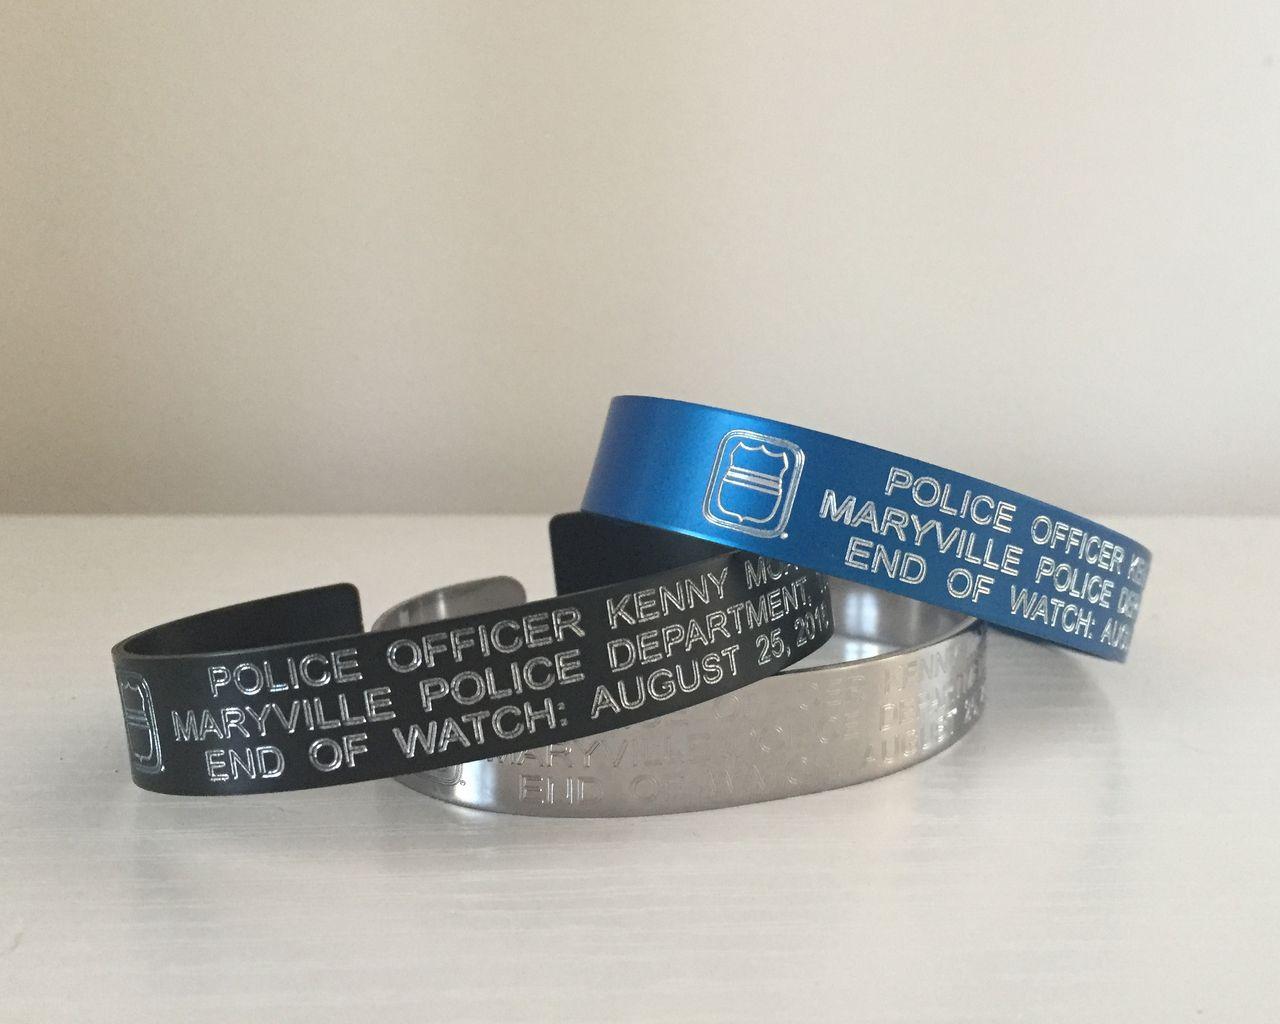 Personalized Odmp Memorial Bracelets Honoring Fallen Officers